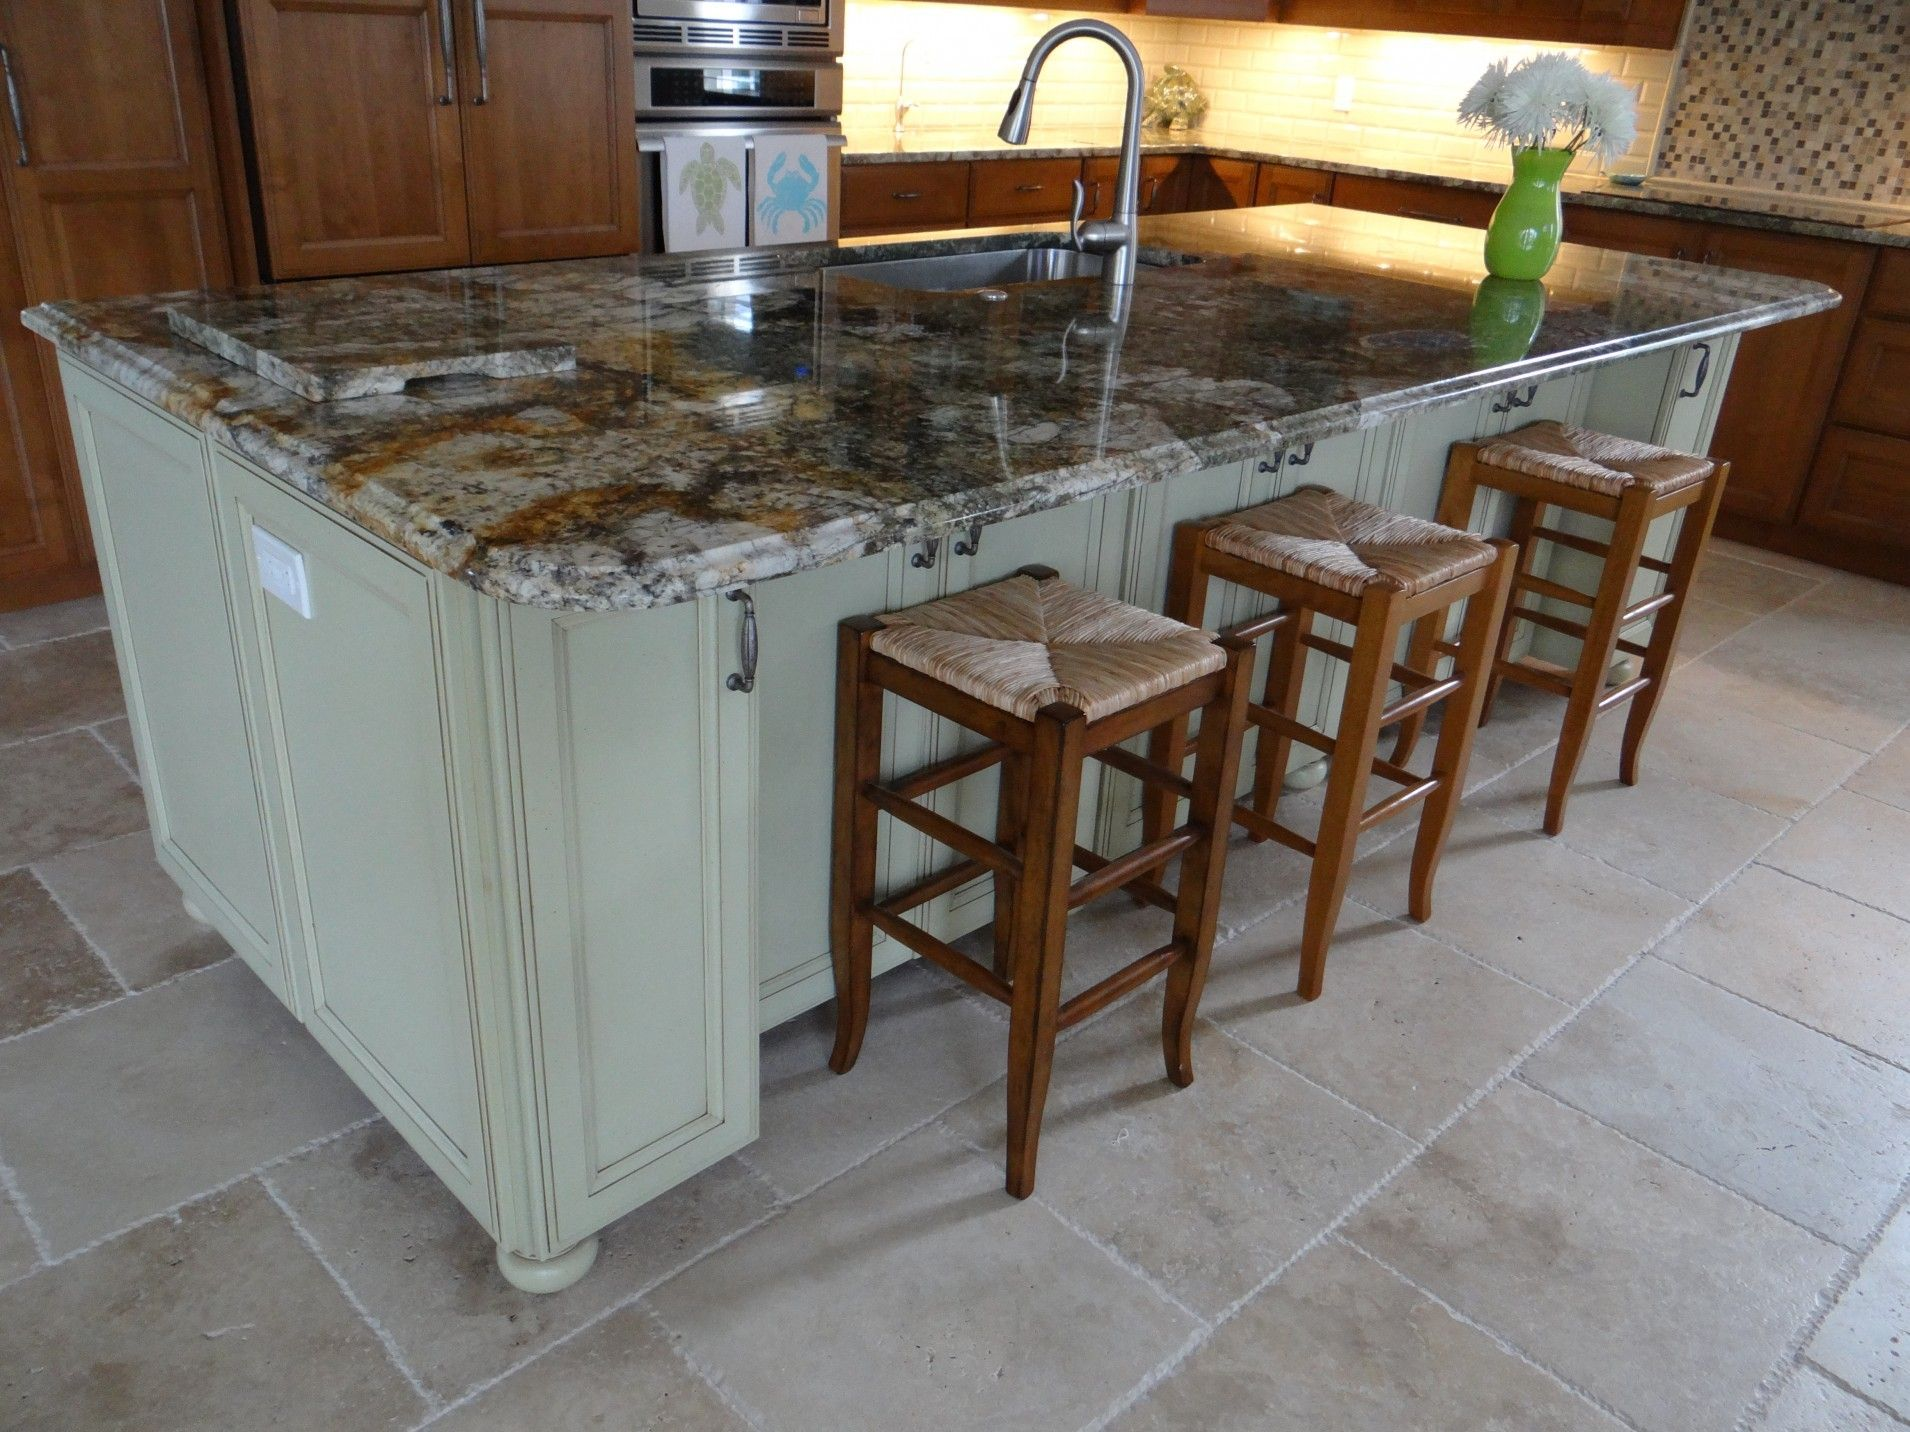 Holiday Kitchens Davenport 3 In. Stiles U0026 Rails   Dealer: Inndesign Inc   FL